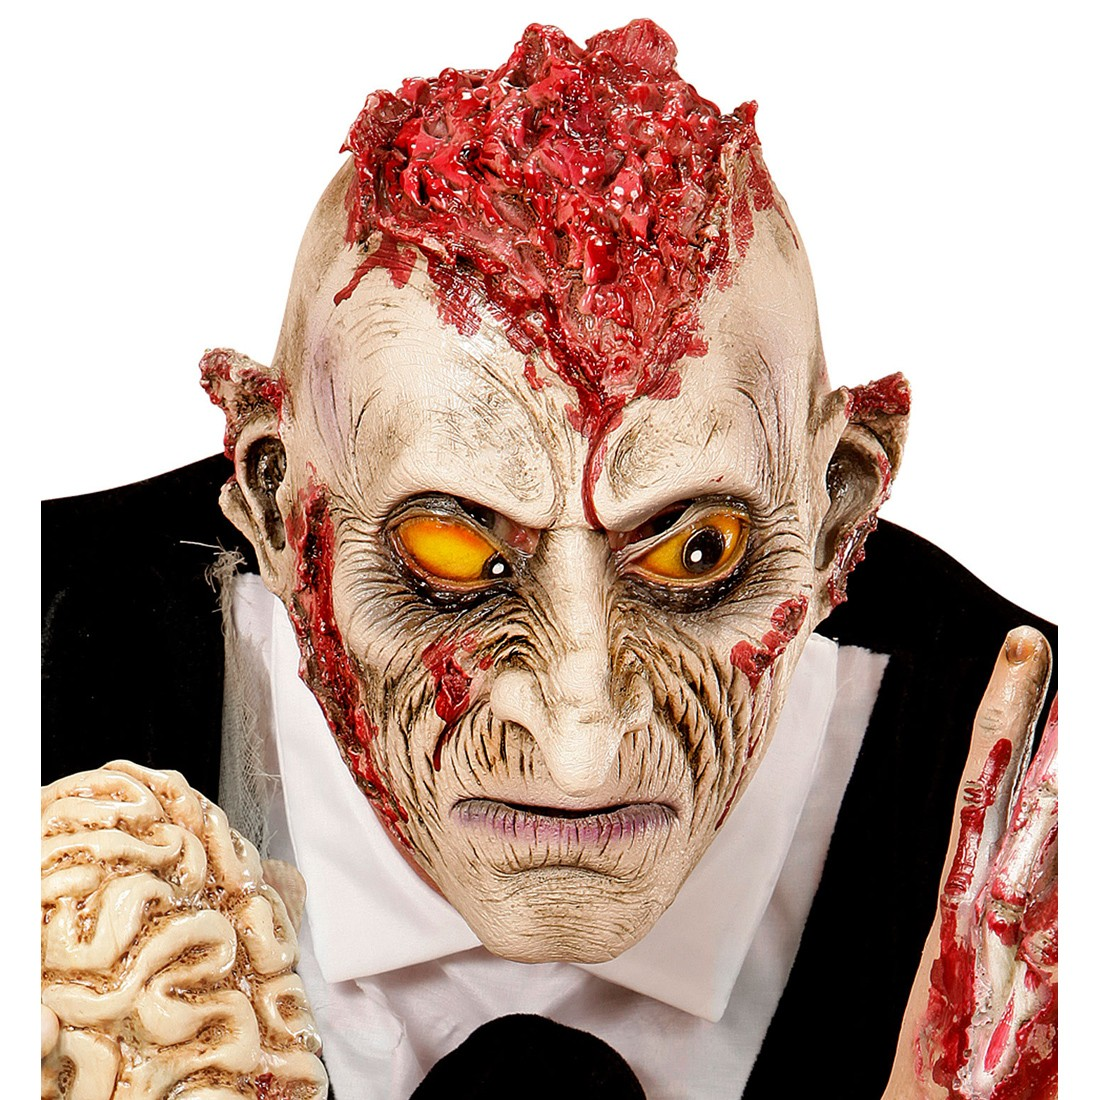 Zombie maske psycho monstermaske offenes gehirn horror zombiemaske hallowee 13 99 - Masque halloween qui fait peur ...